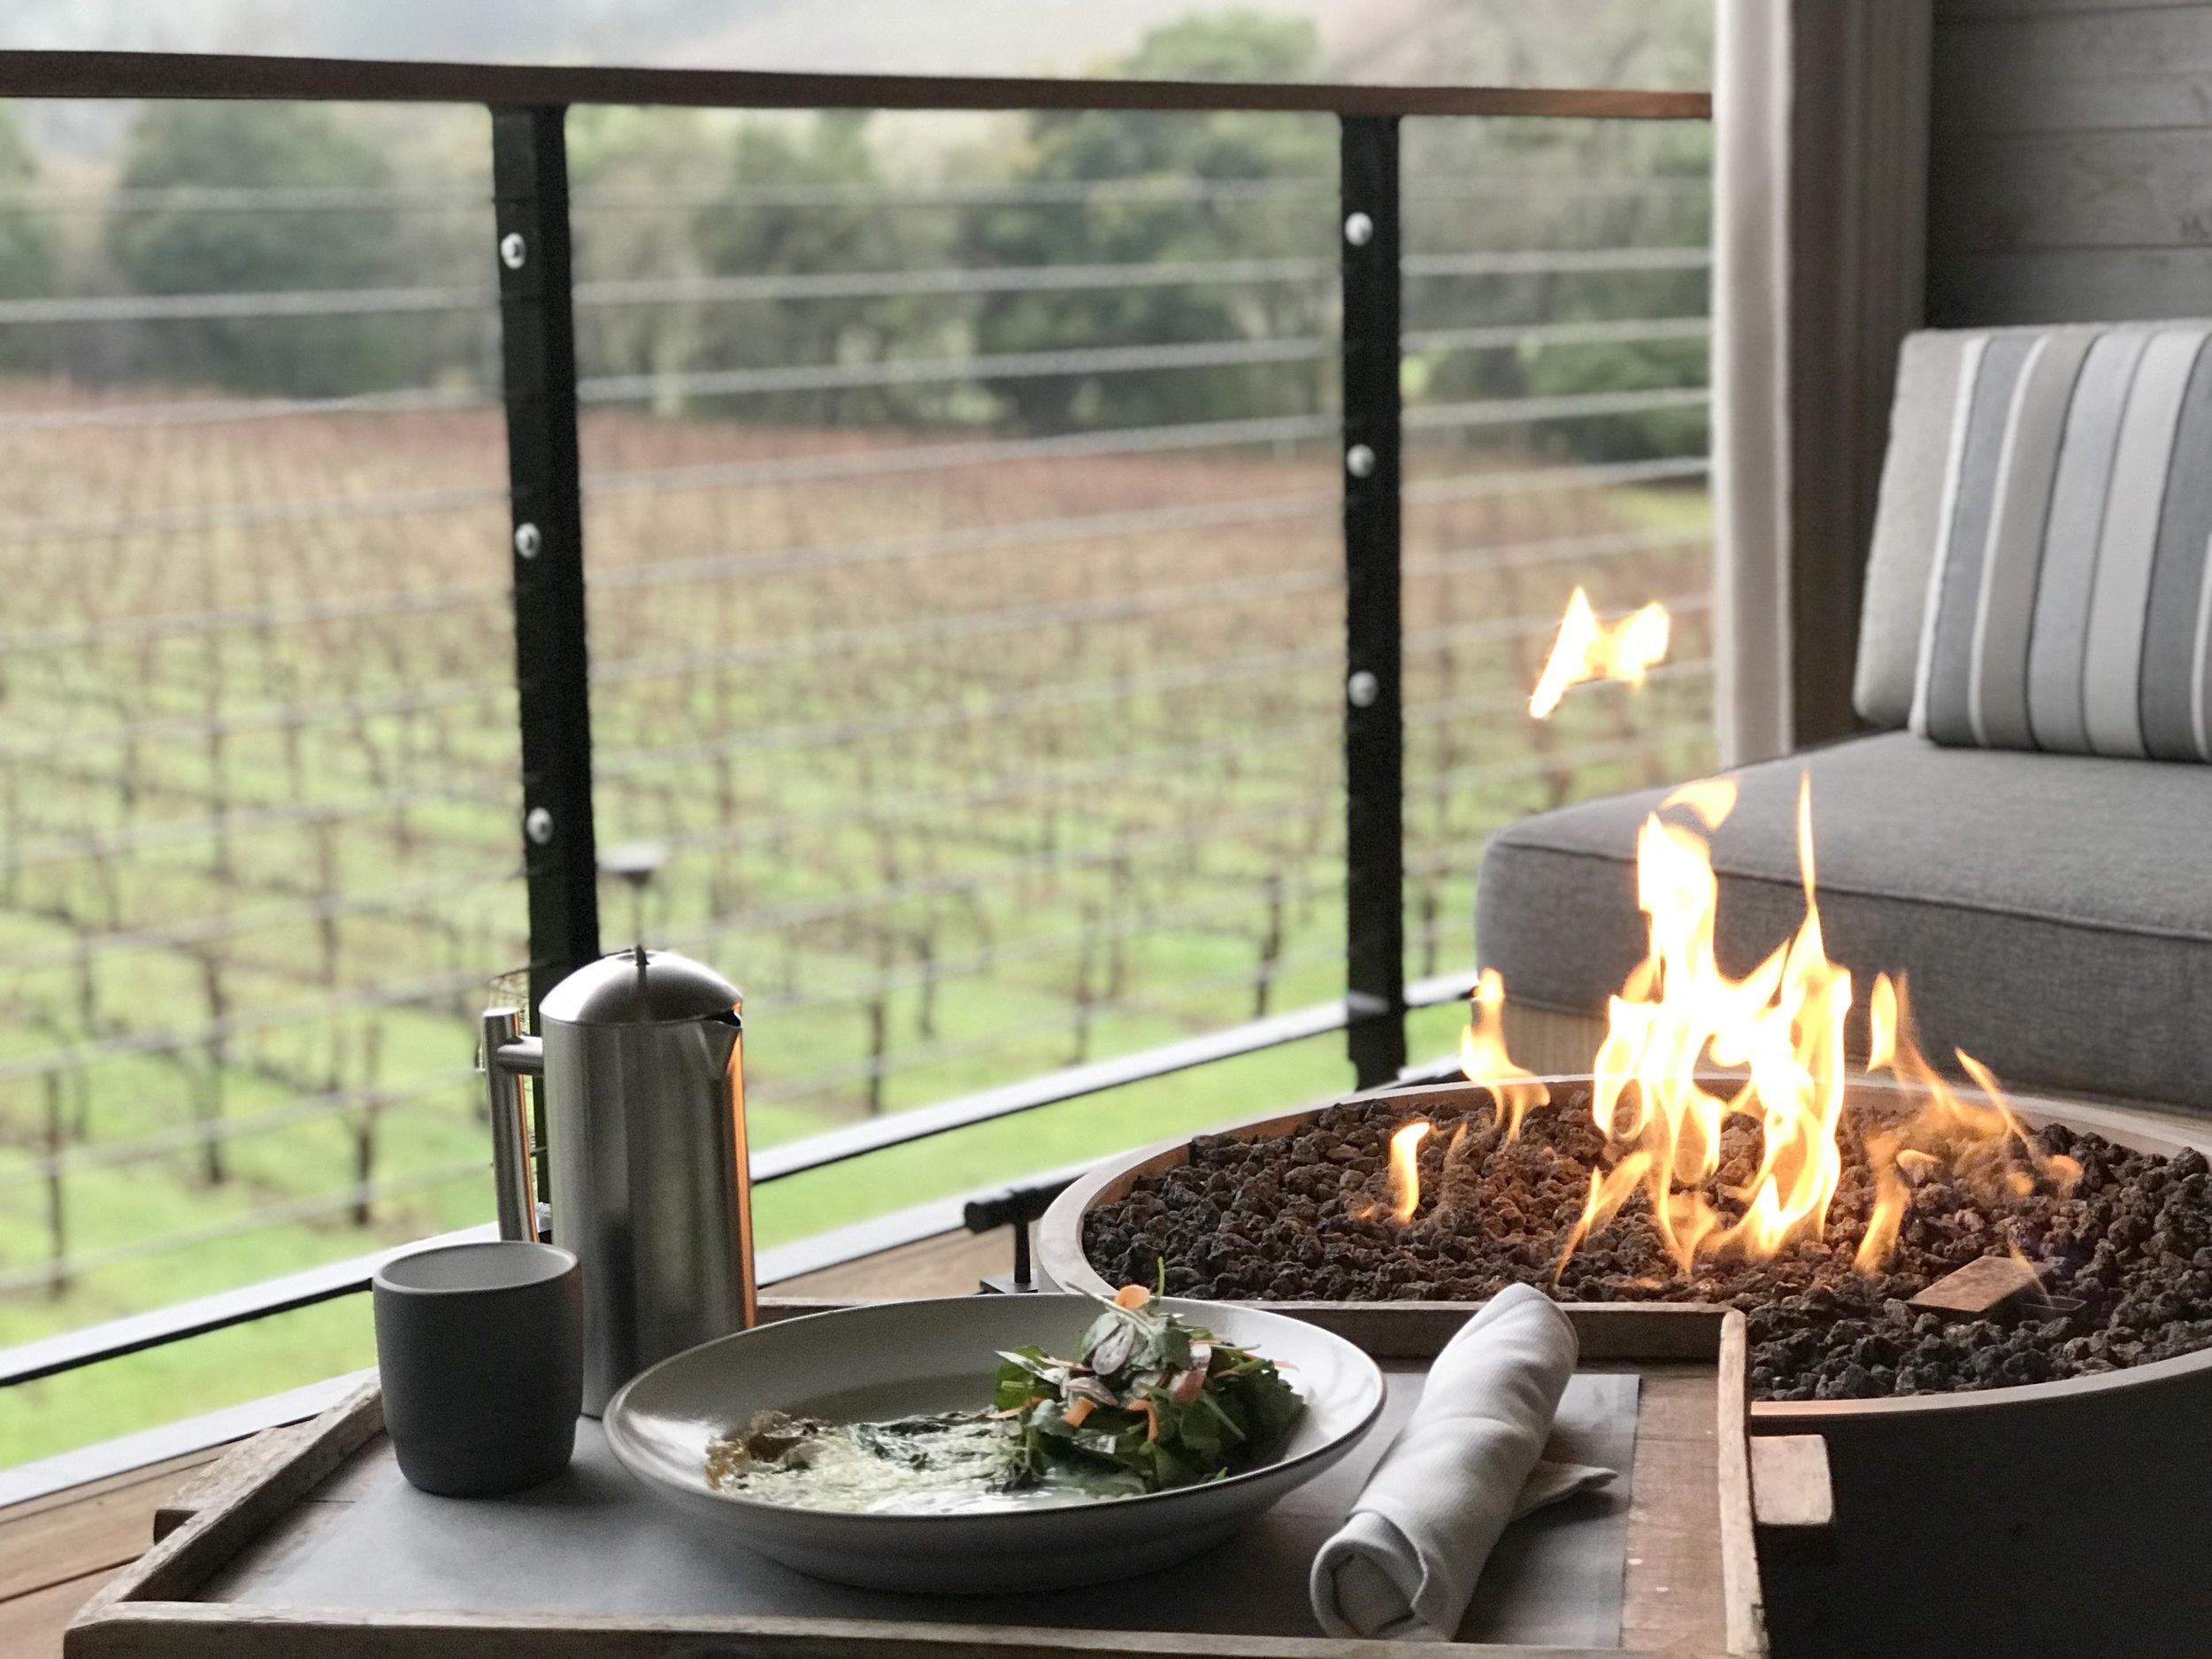 las-alcobas-hotel-napa-st-helena-breakfast-on-the-patio-firepit.jpg